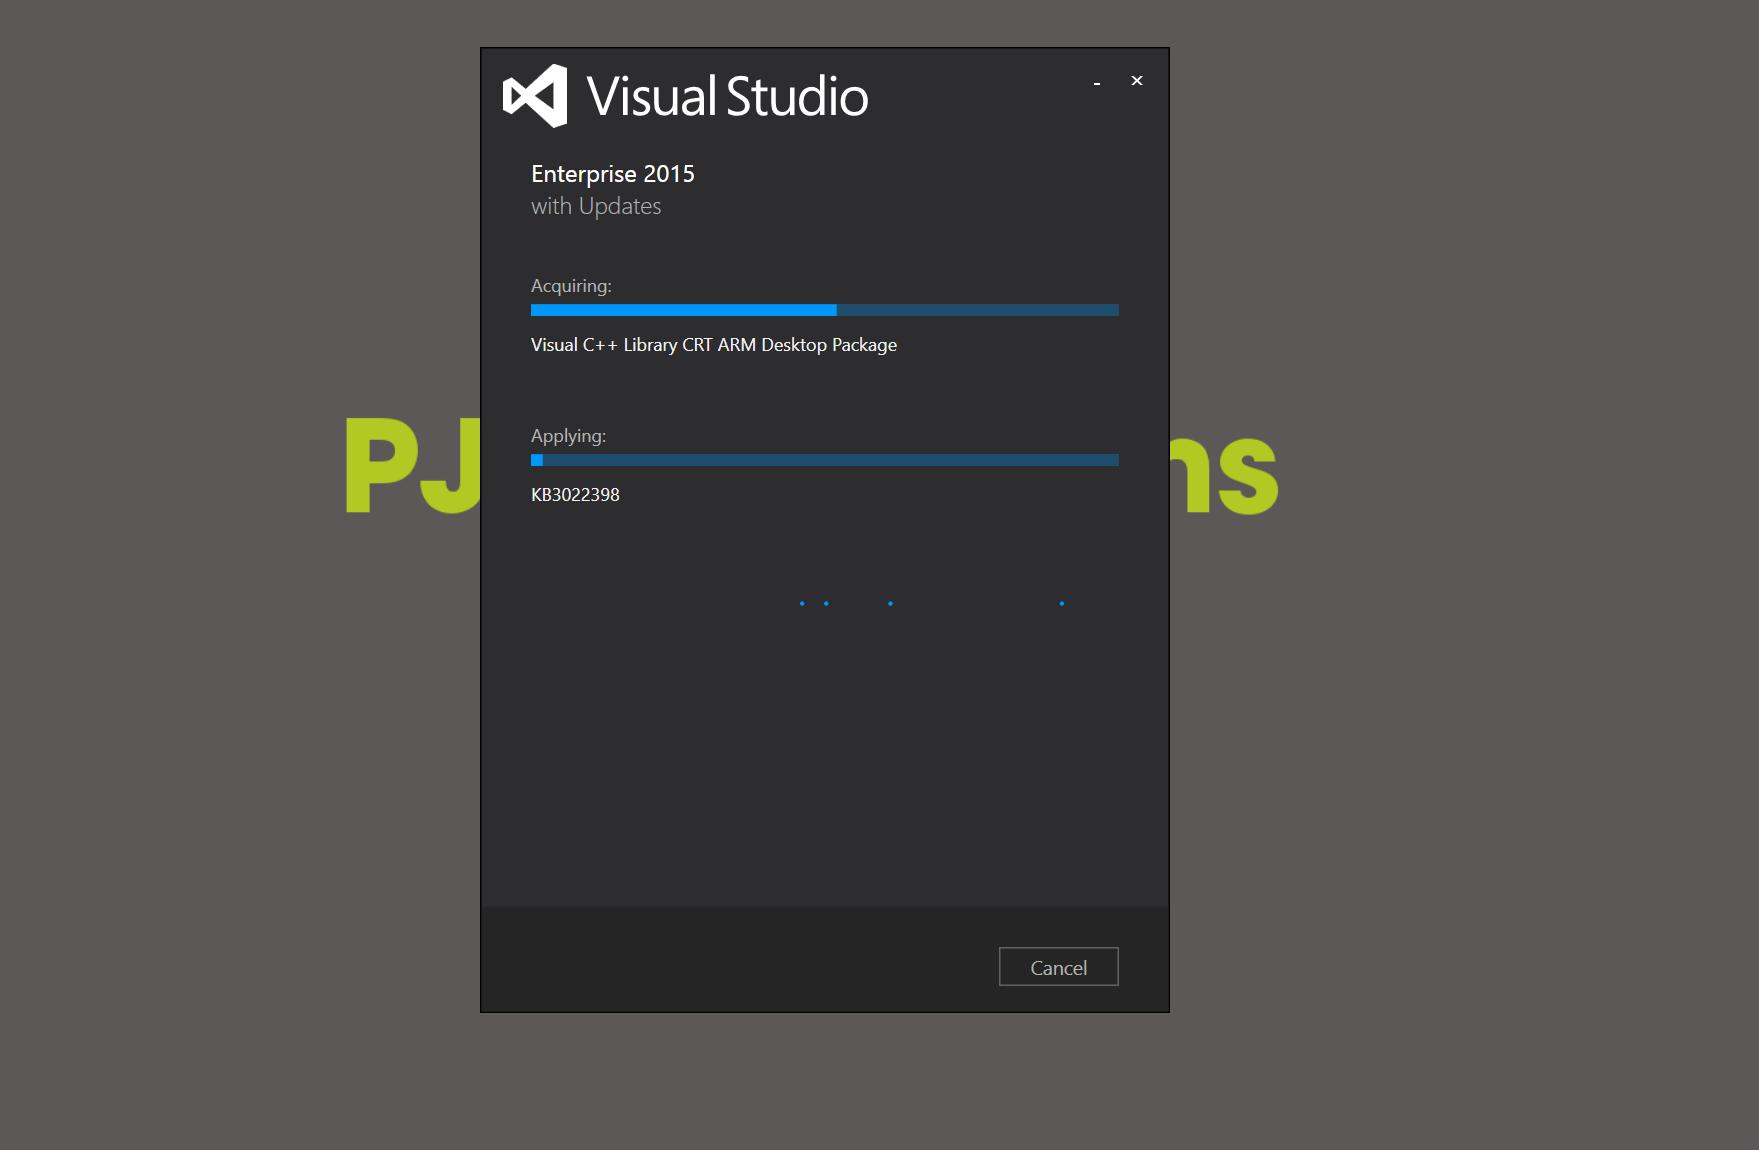 10 - Install Visual Studio